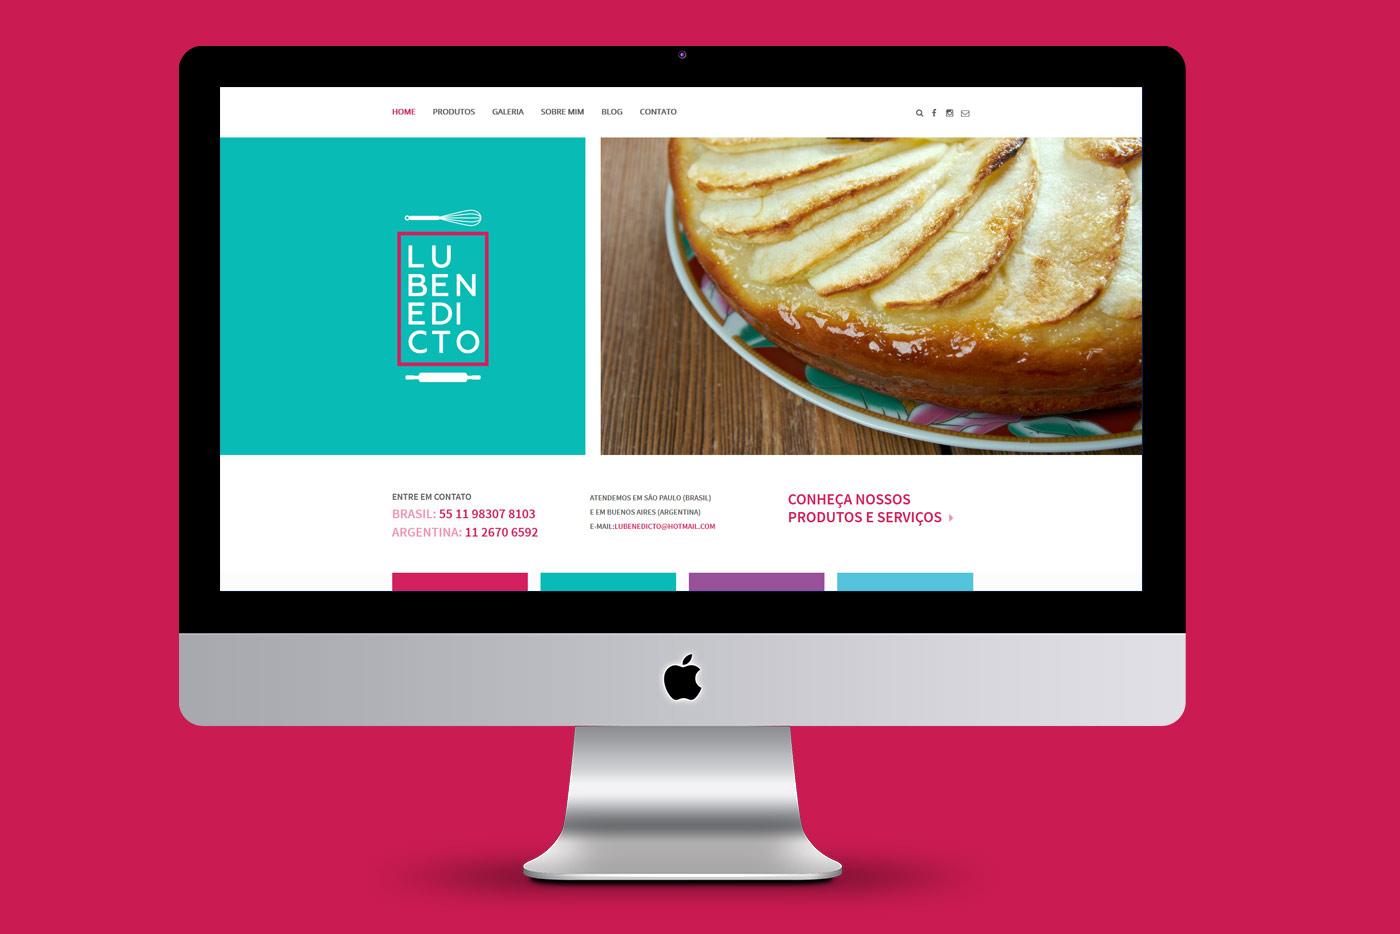 Lu Benedicto Chef Confeiteira - Identidade Visual Corporativa